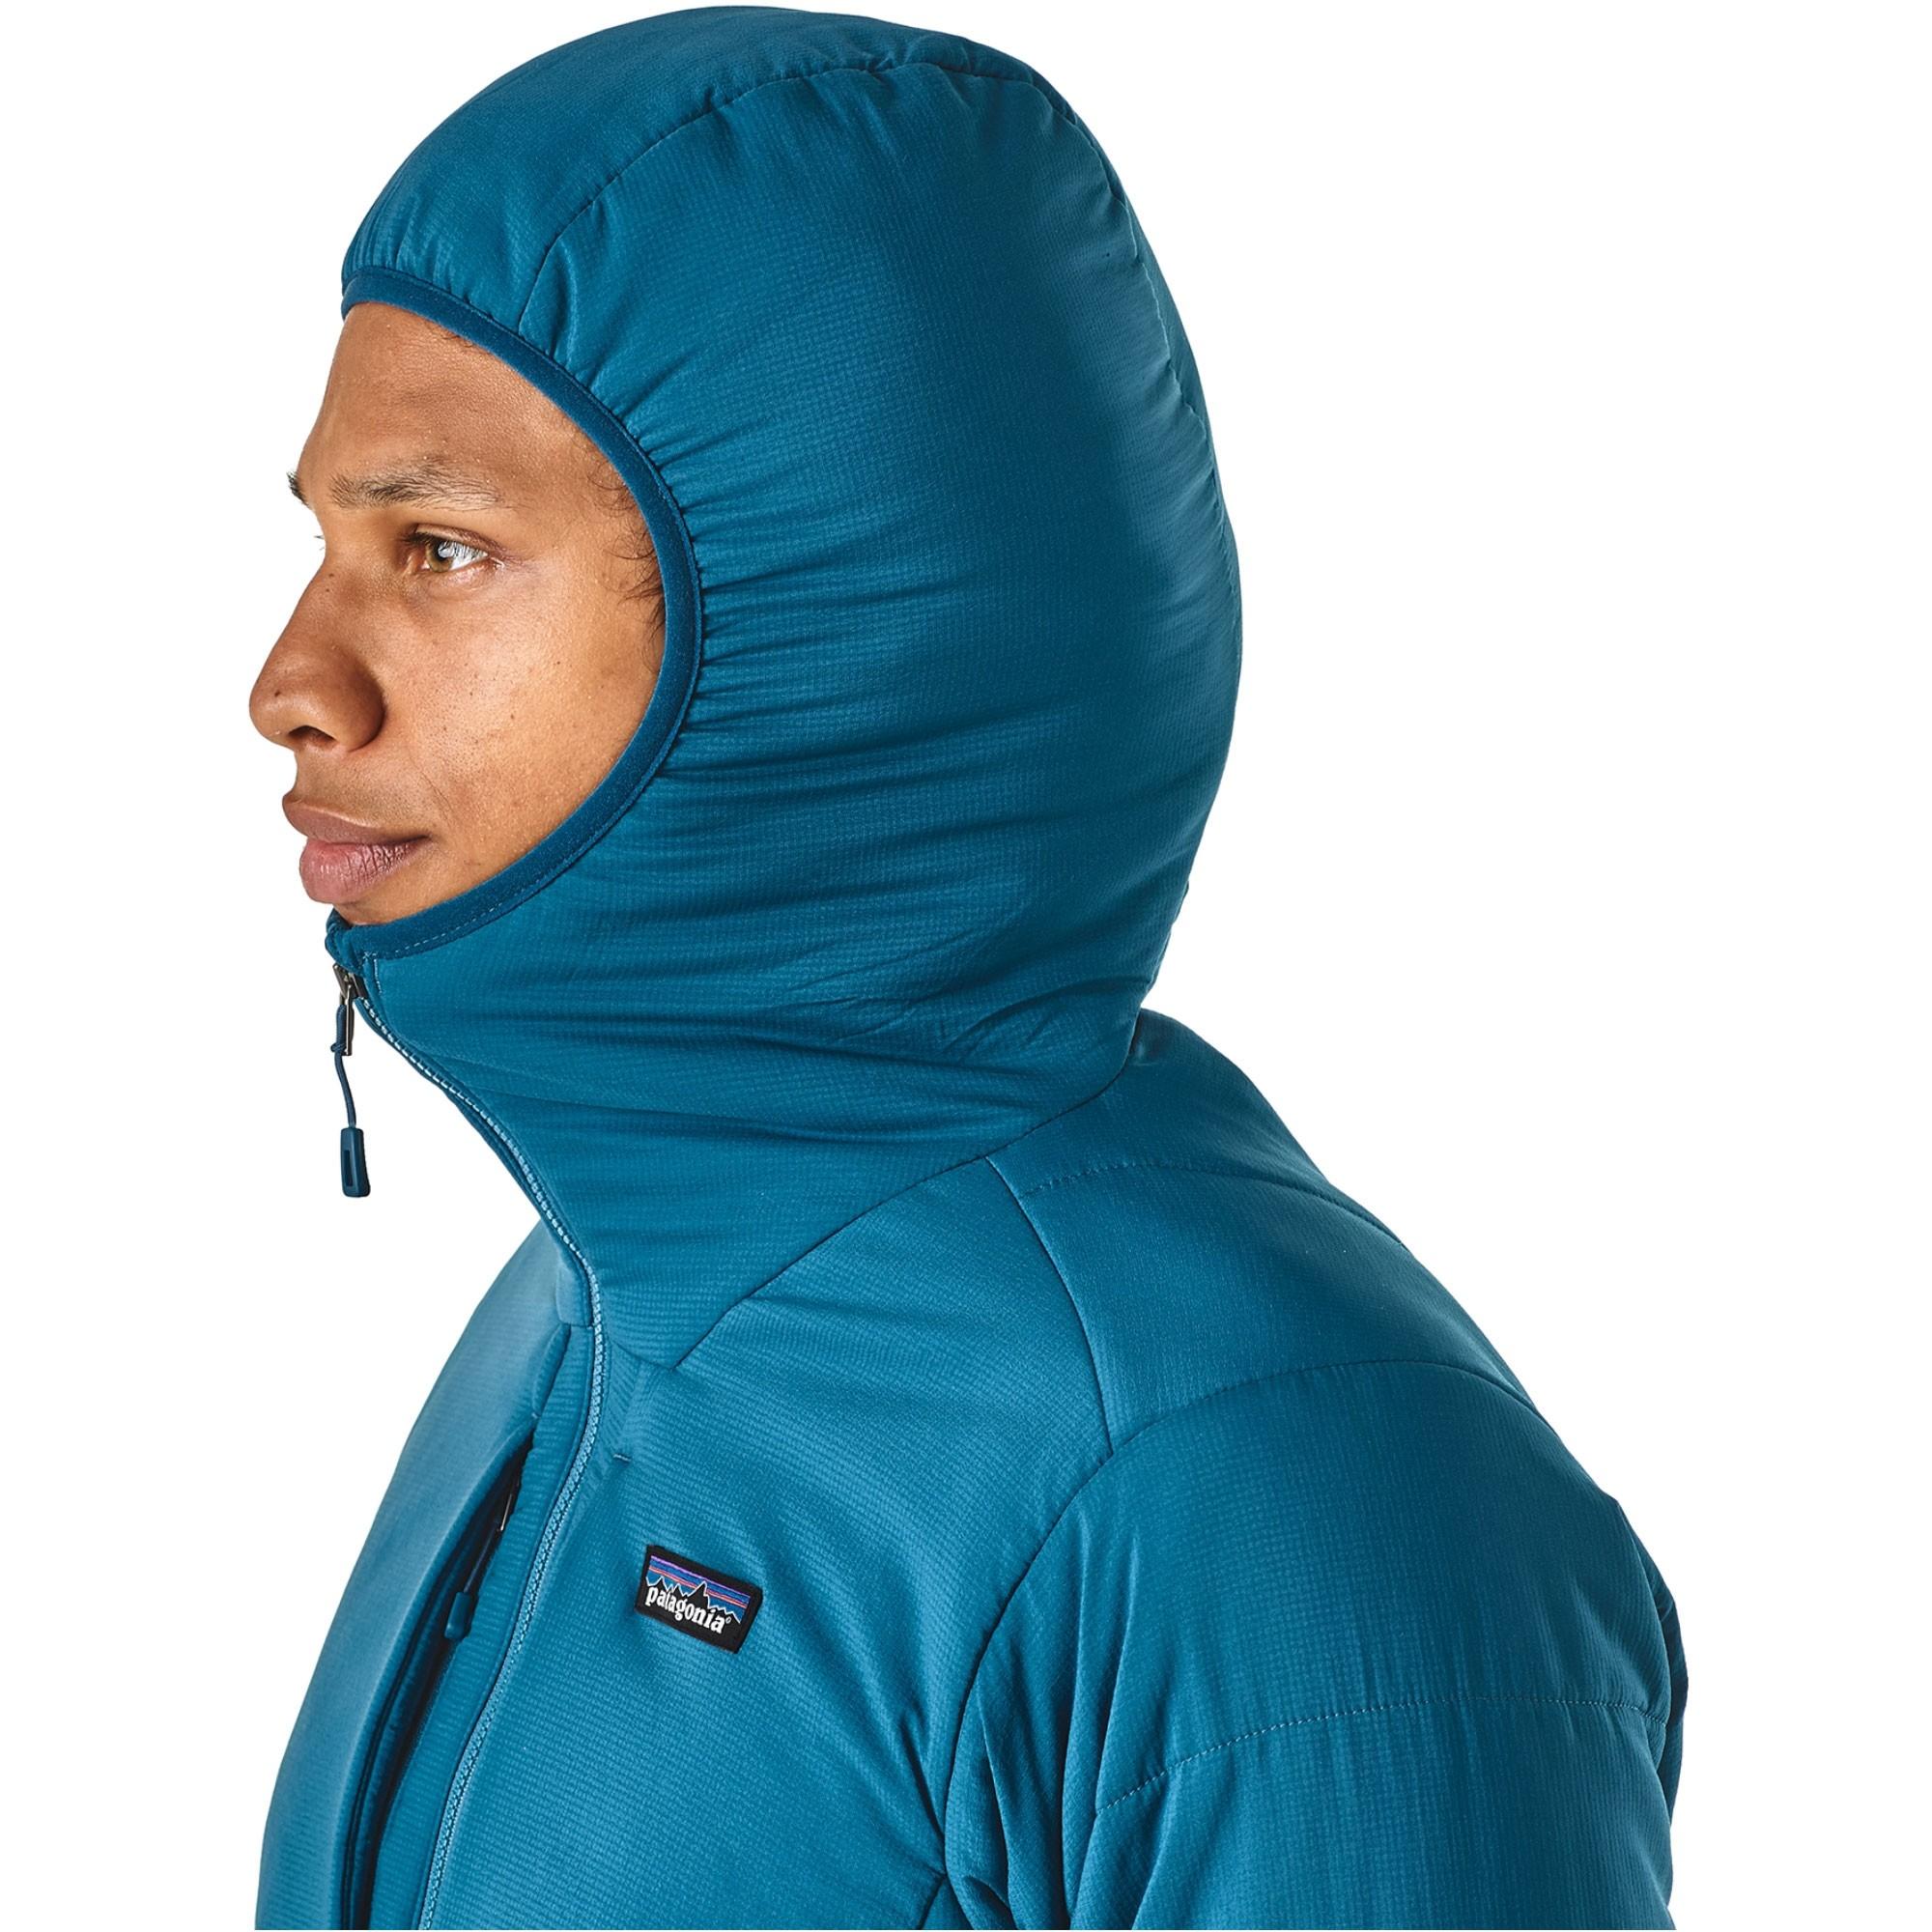 Patagonia Nano-Air Men's Hoody - Big Sur Blue - hood